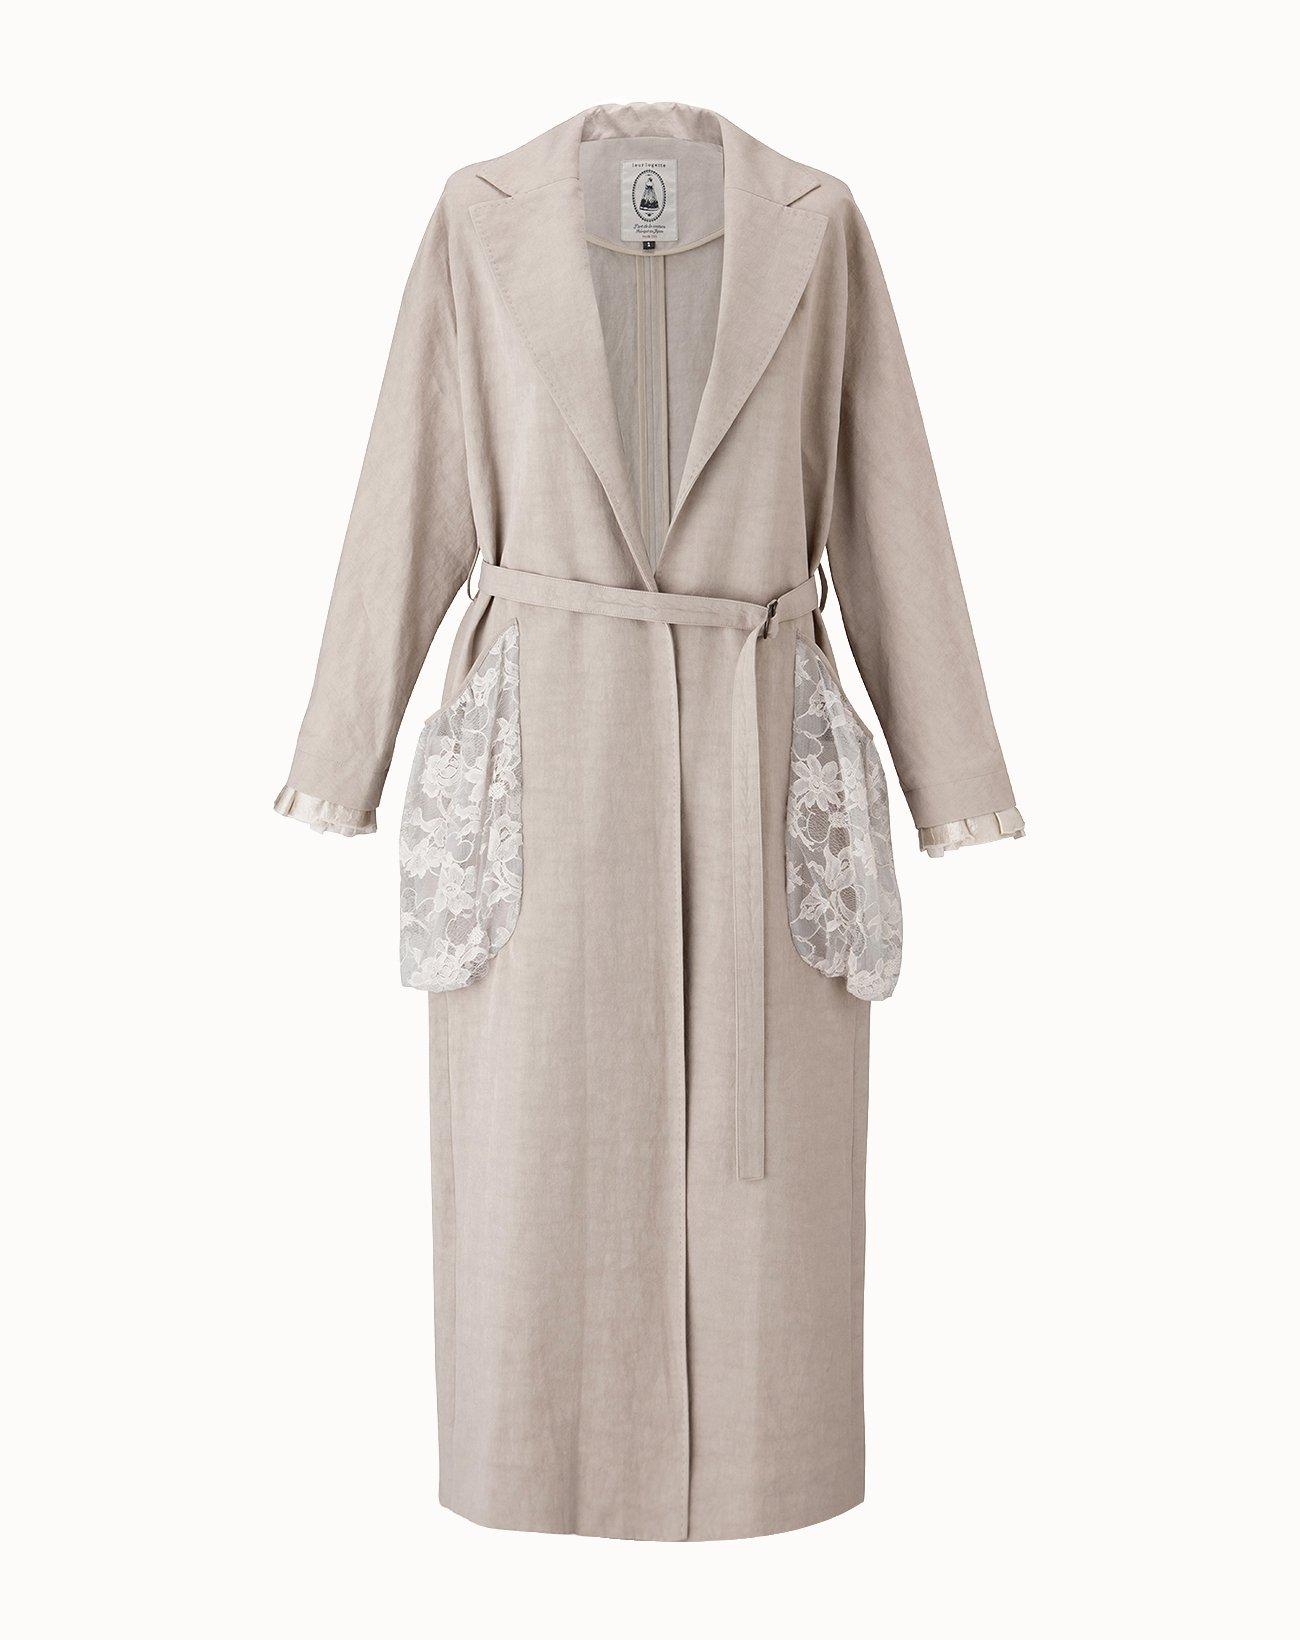 leur logette - Vintage Linen Coat - Beige